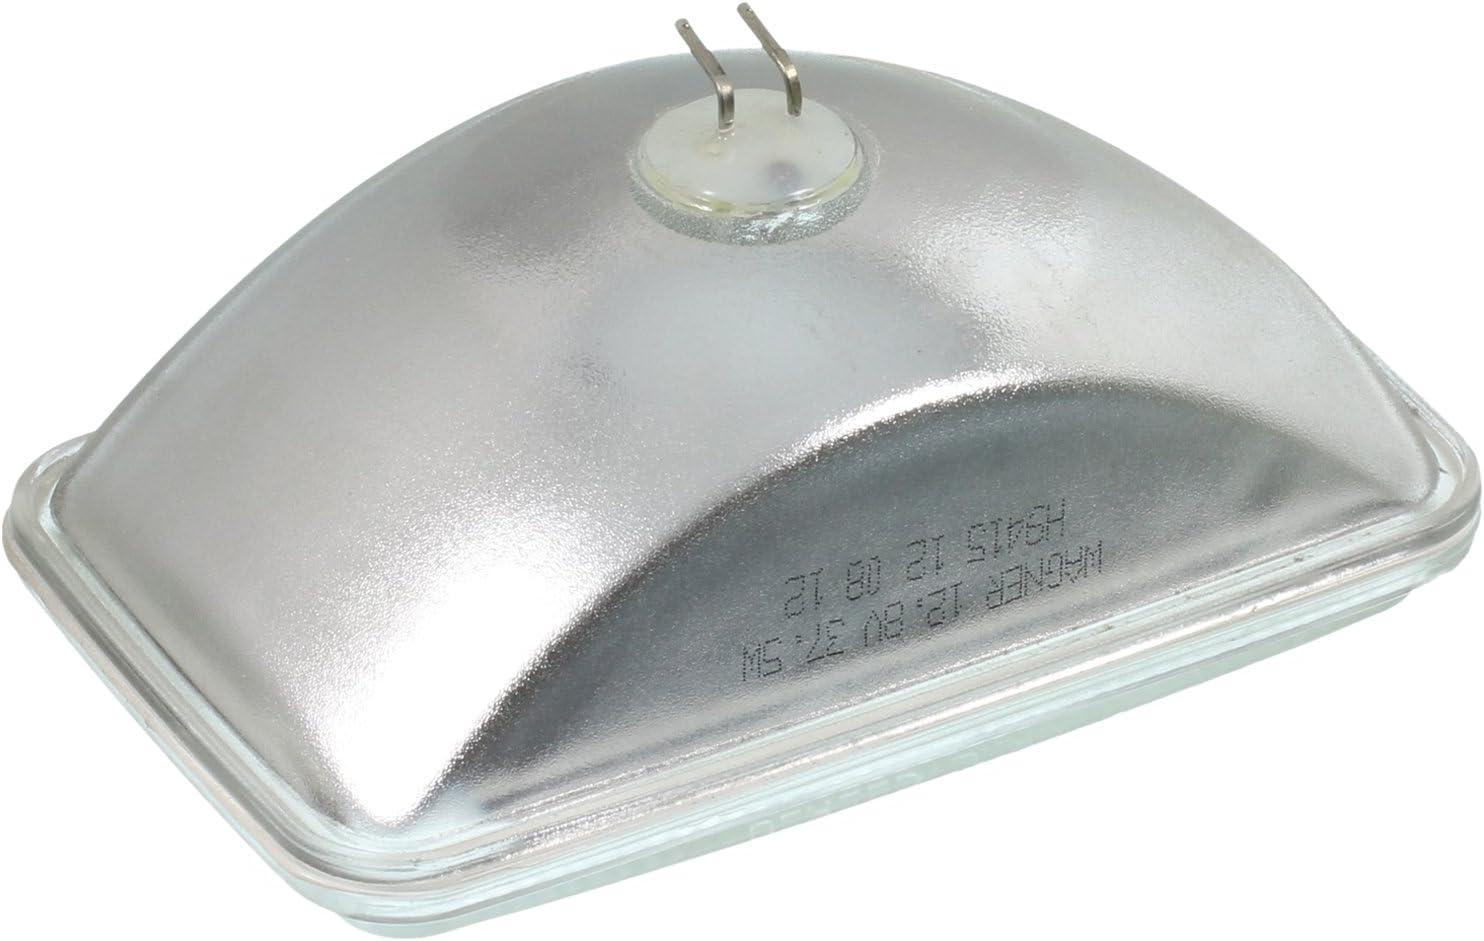 Box of 1 Wagner Lighting H9415 Sealed Beam